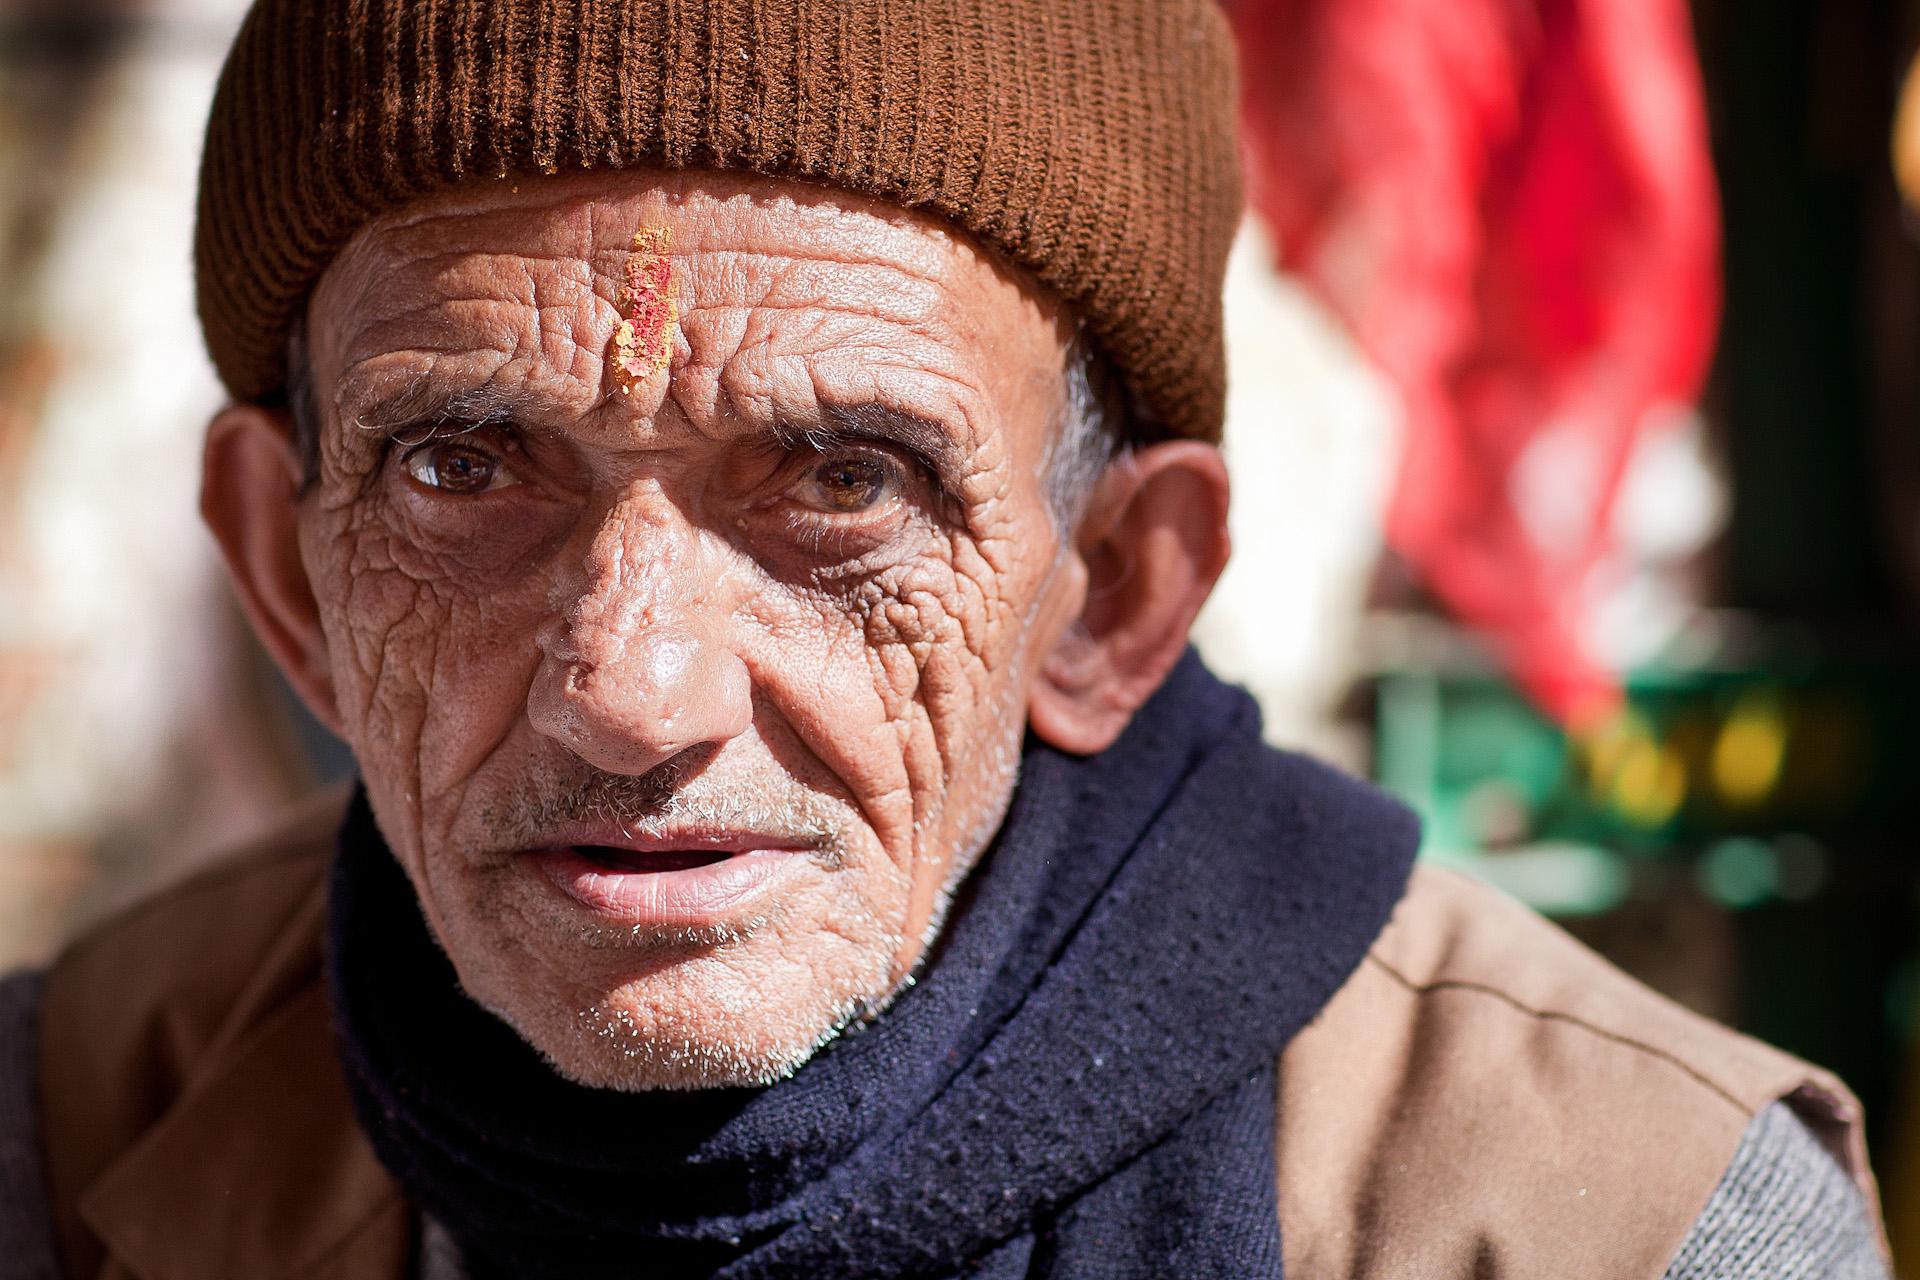 India-Darjeeling-Sikkim-Travel-Portrait-1.JPG